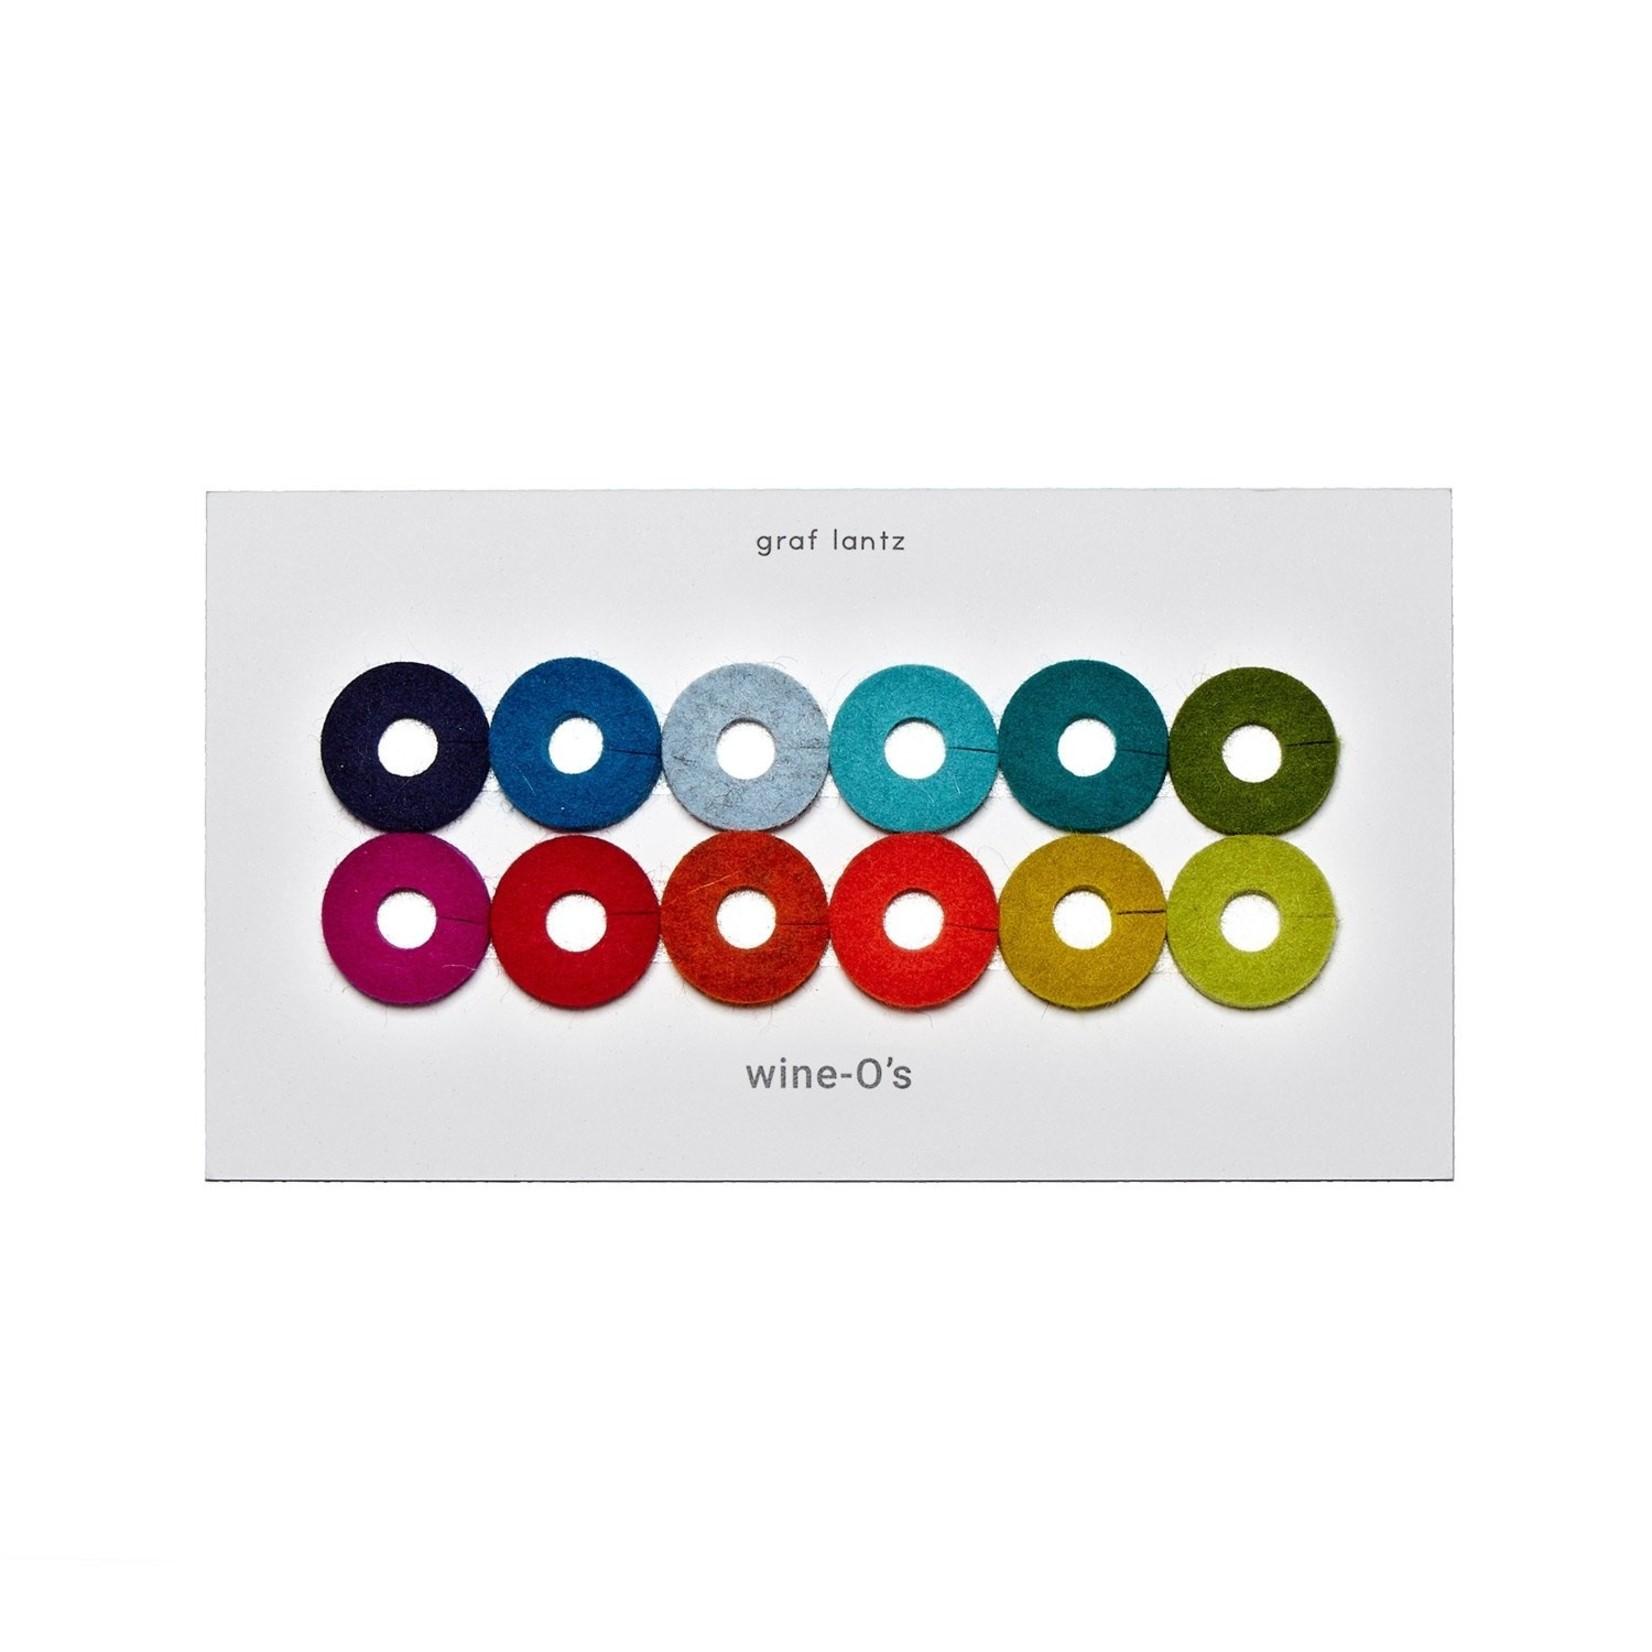 Graf & Lantz Graf & Lantz Wine-O's Mix 12pc Rainbow